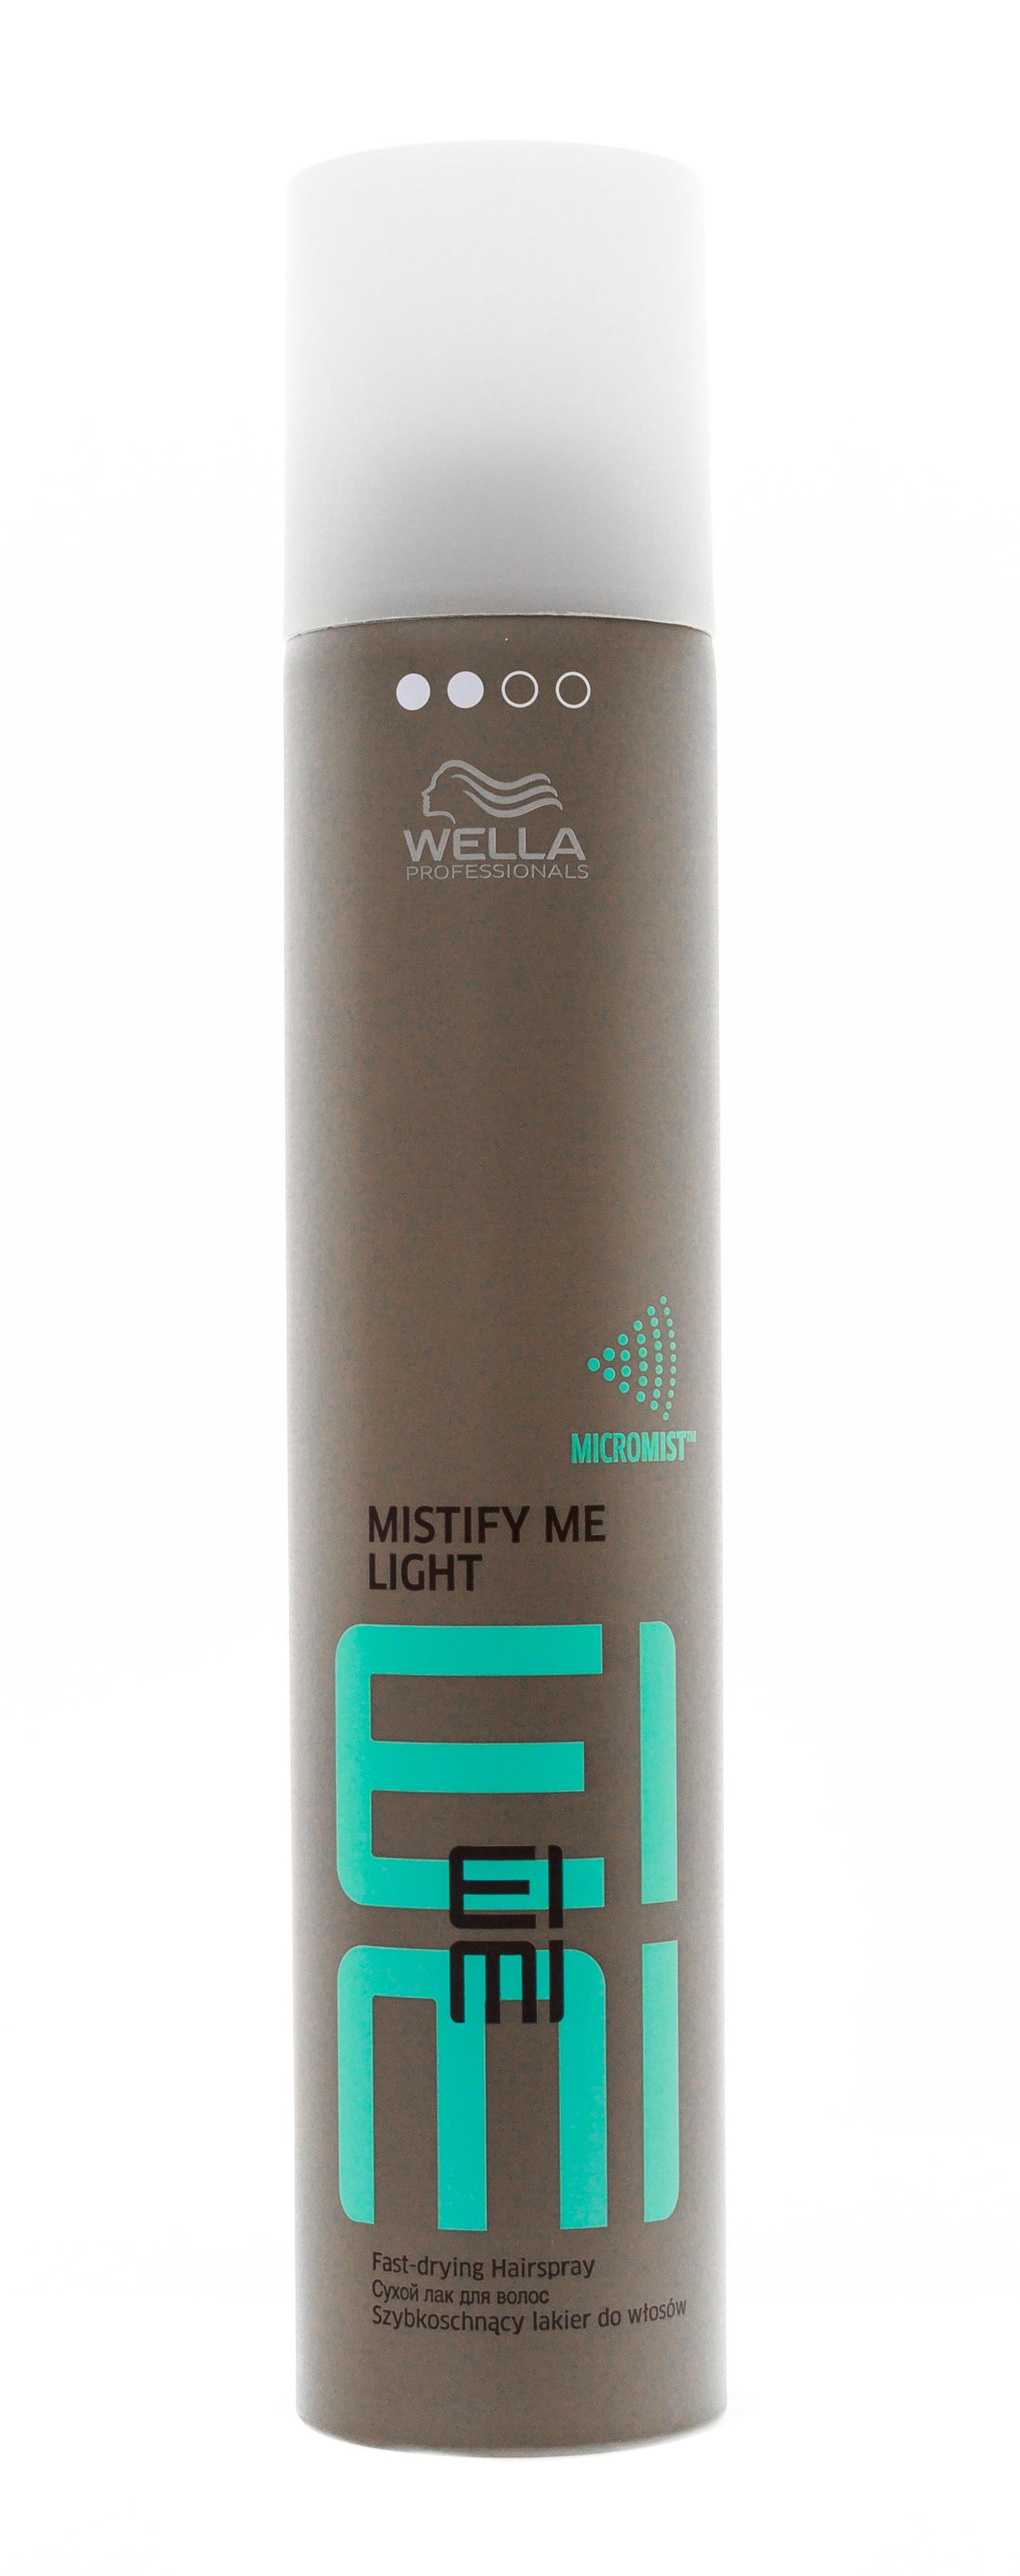 Wella Professional Сухой лак легкой фиксации, 300 мл (Wella Professional, Eimi Фиксация)